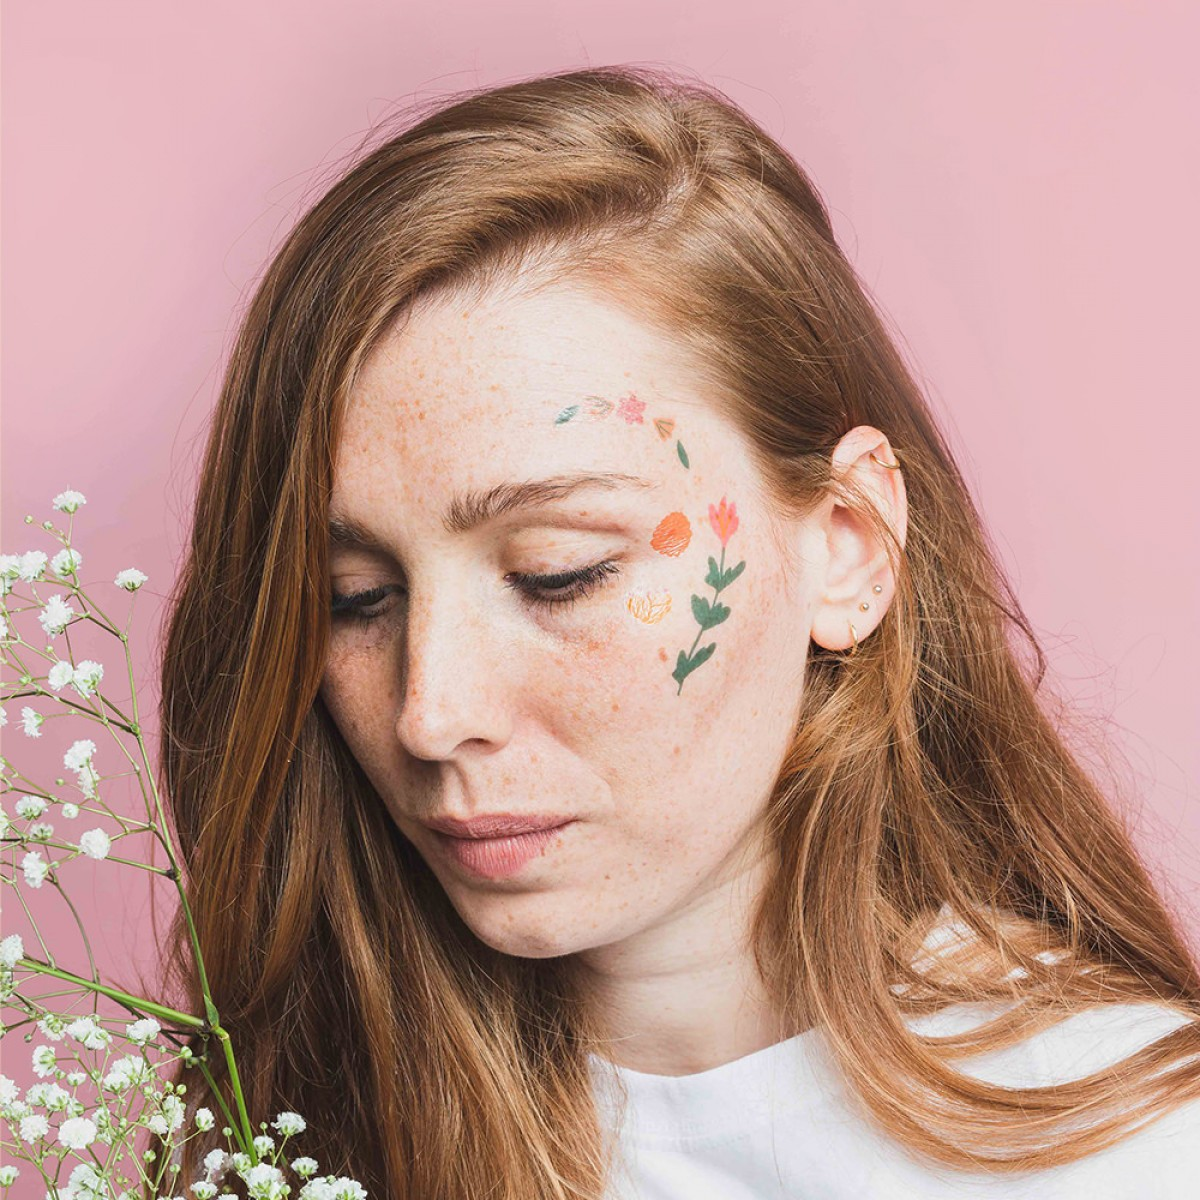 Notietzblock Temporäre Tattoos Blumen Set - bunt